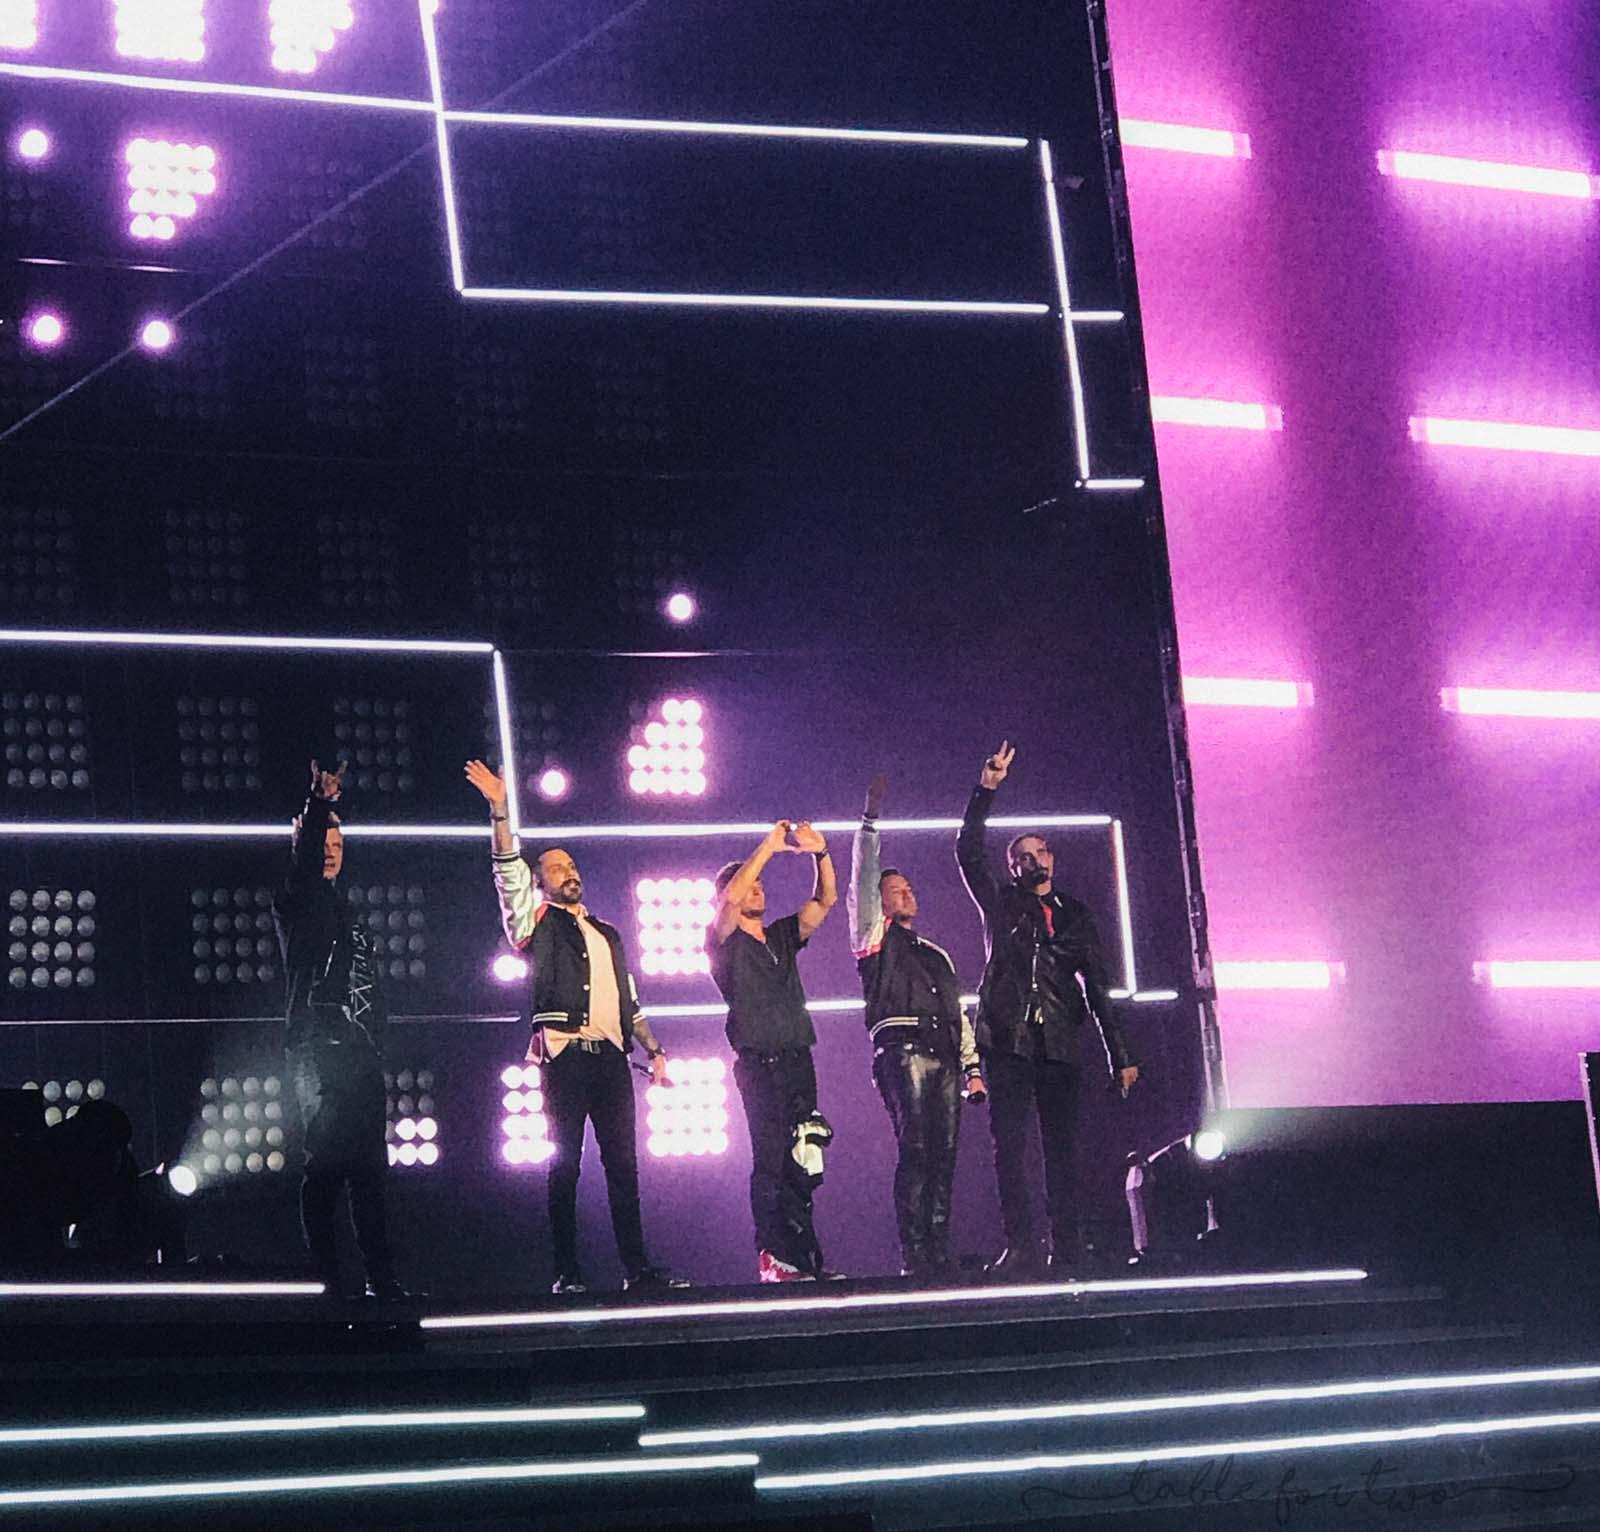 Backstreet Boys Concert in Las Vegas